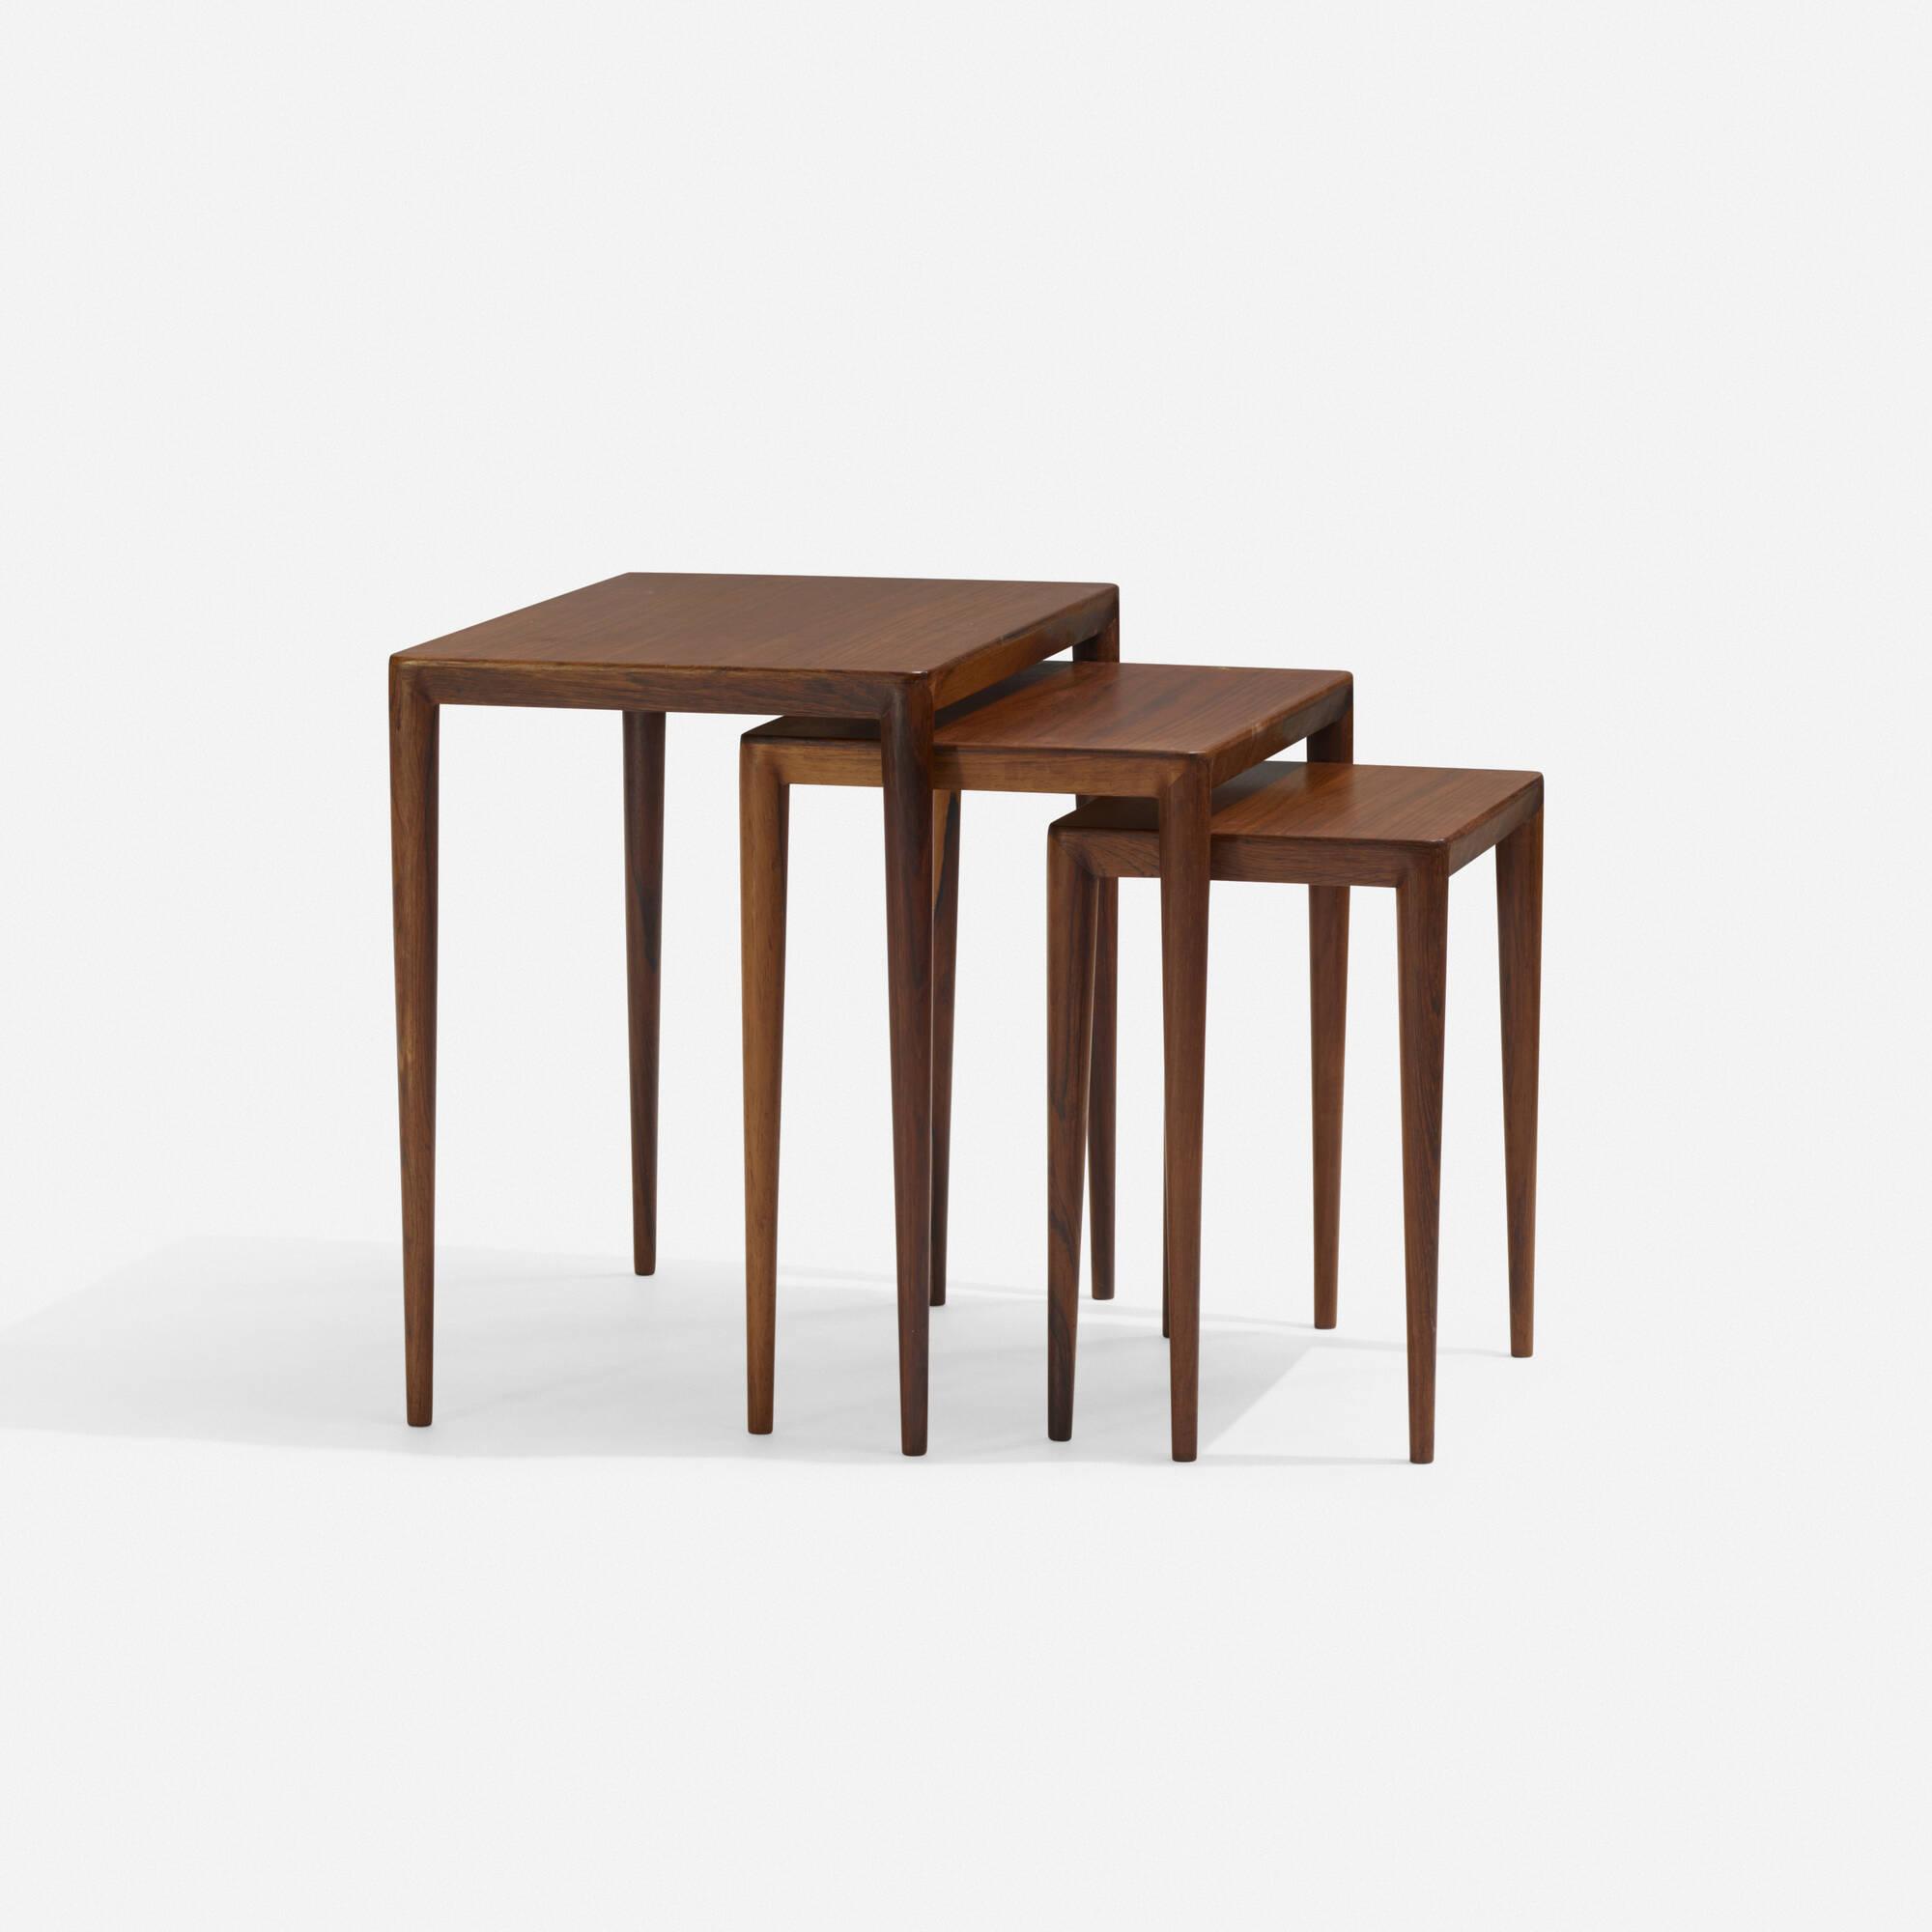 186: Danish / Nesting Tables, Set Of Three (1 Of 2)